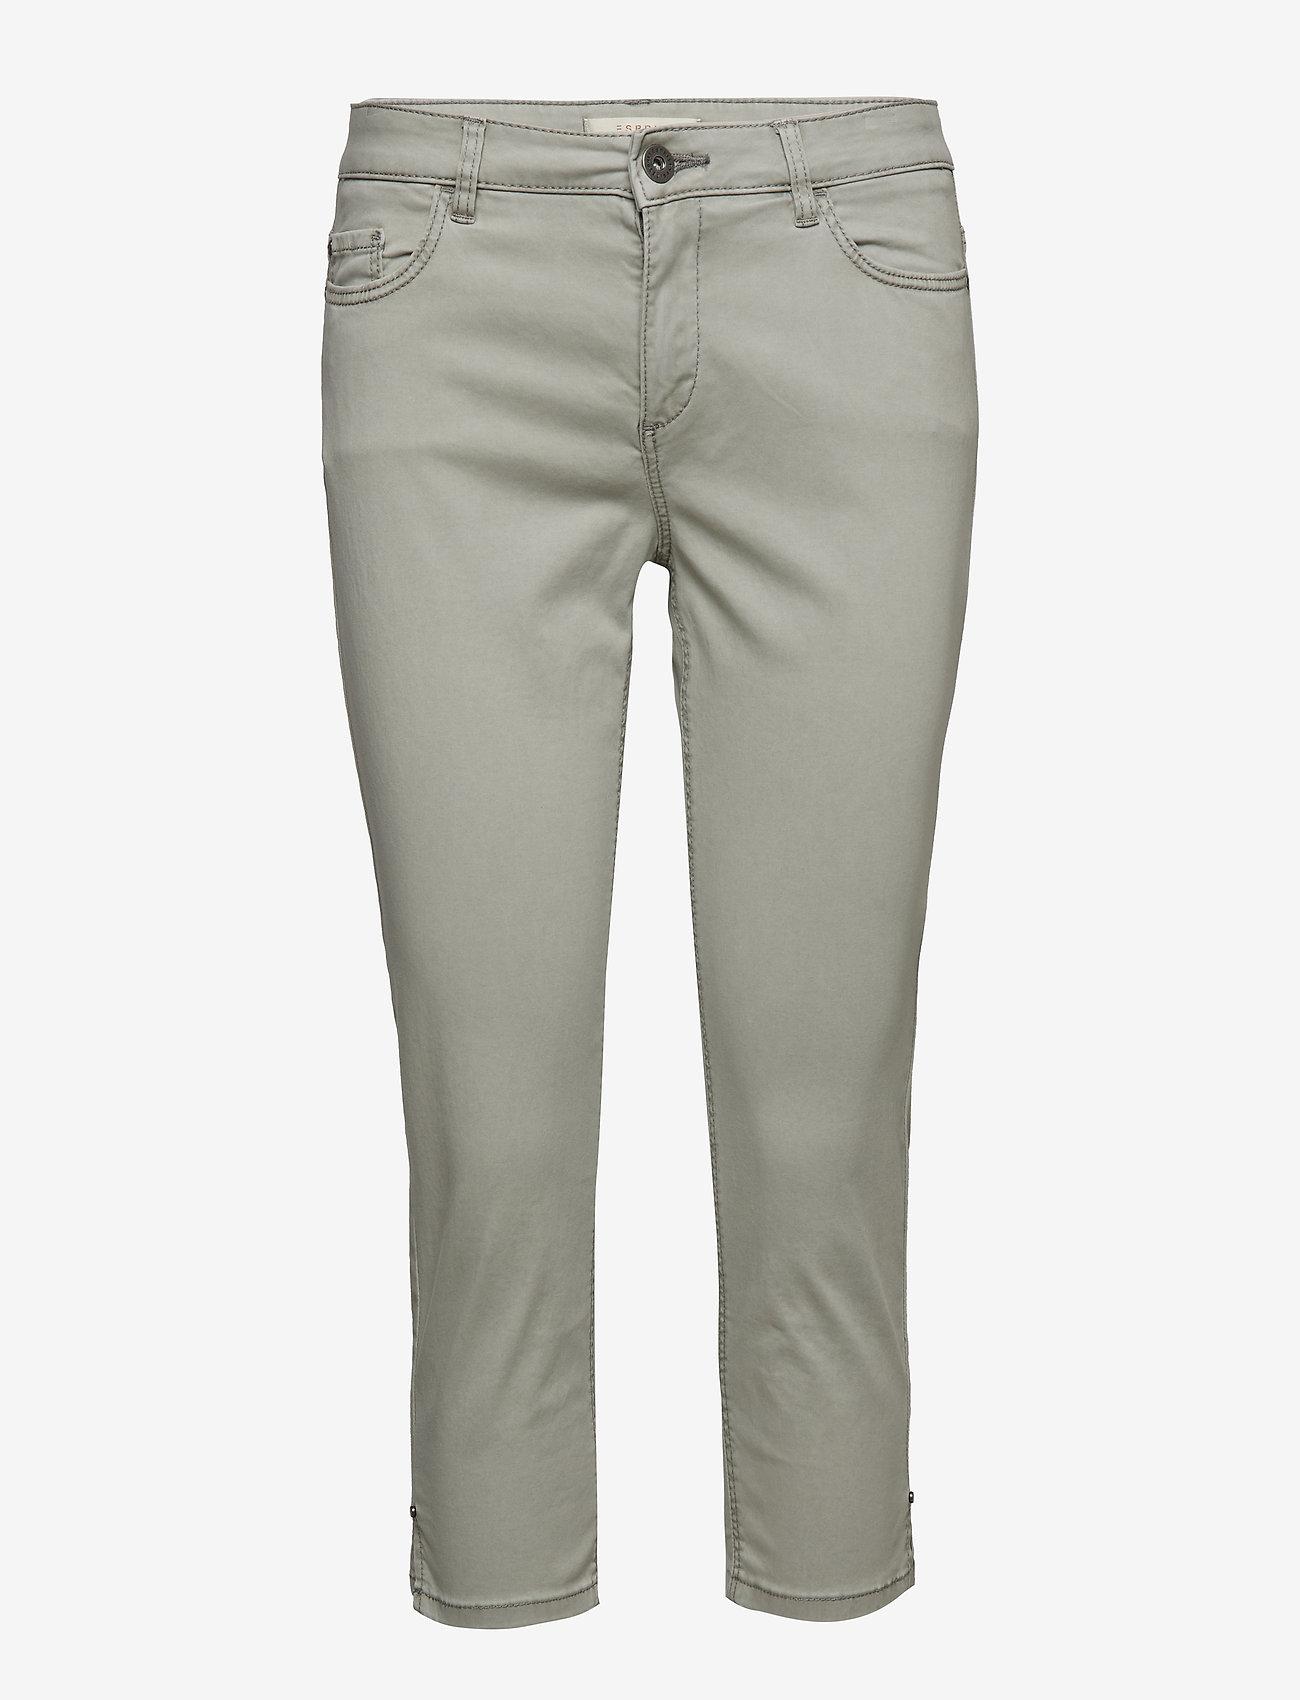 Esprit Casual - Pants woven - casual bukser - light grey - 0